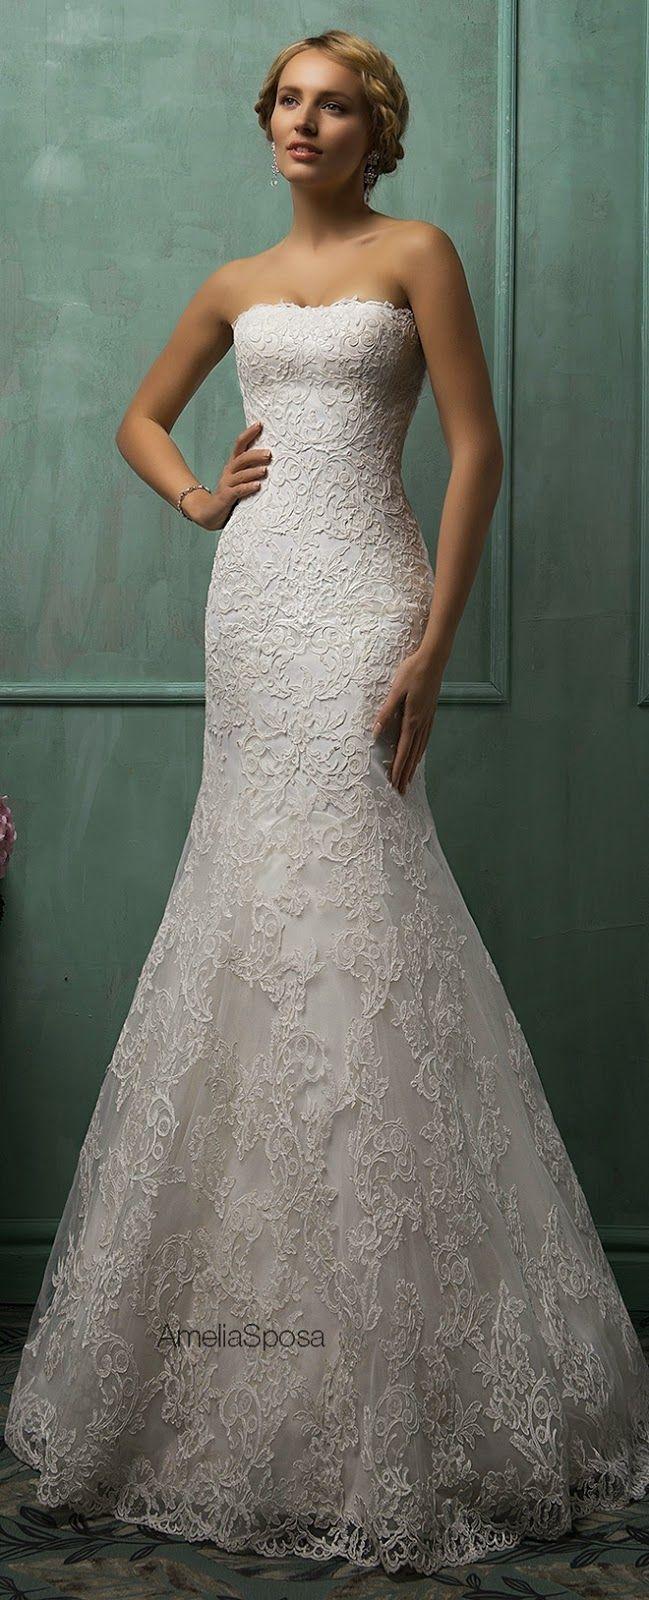 best future wedding images on pinterest wedding inspiration